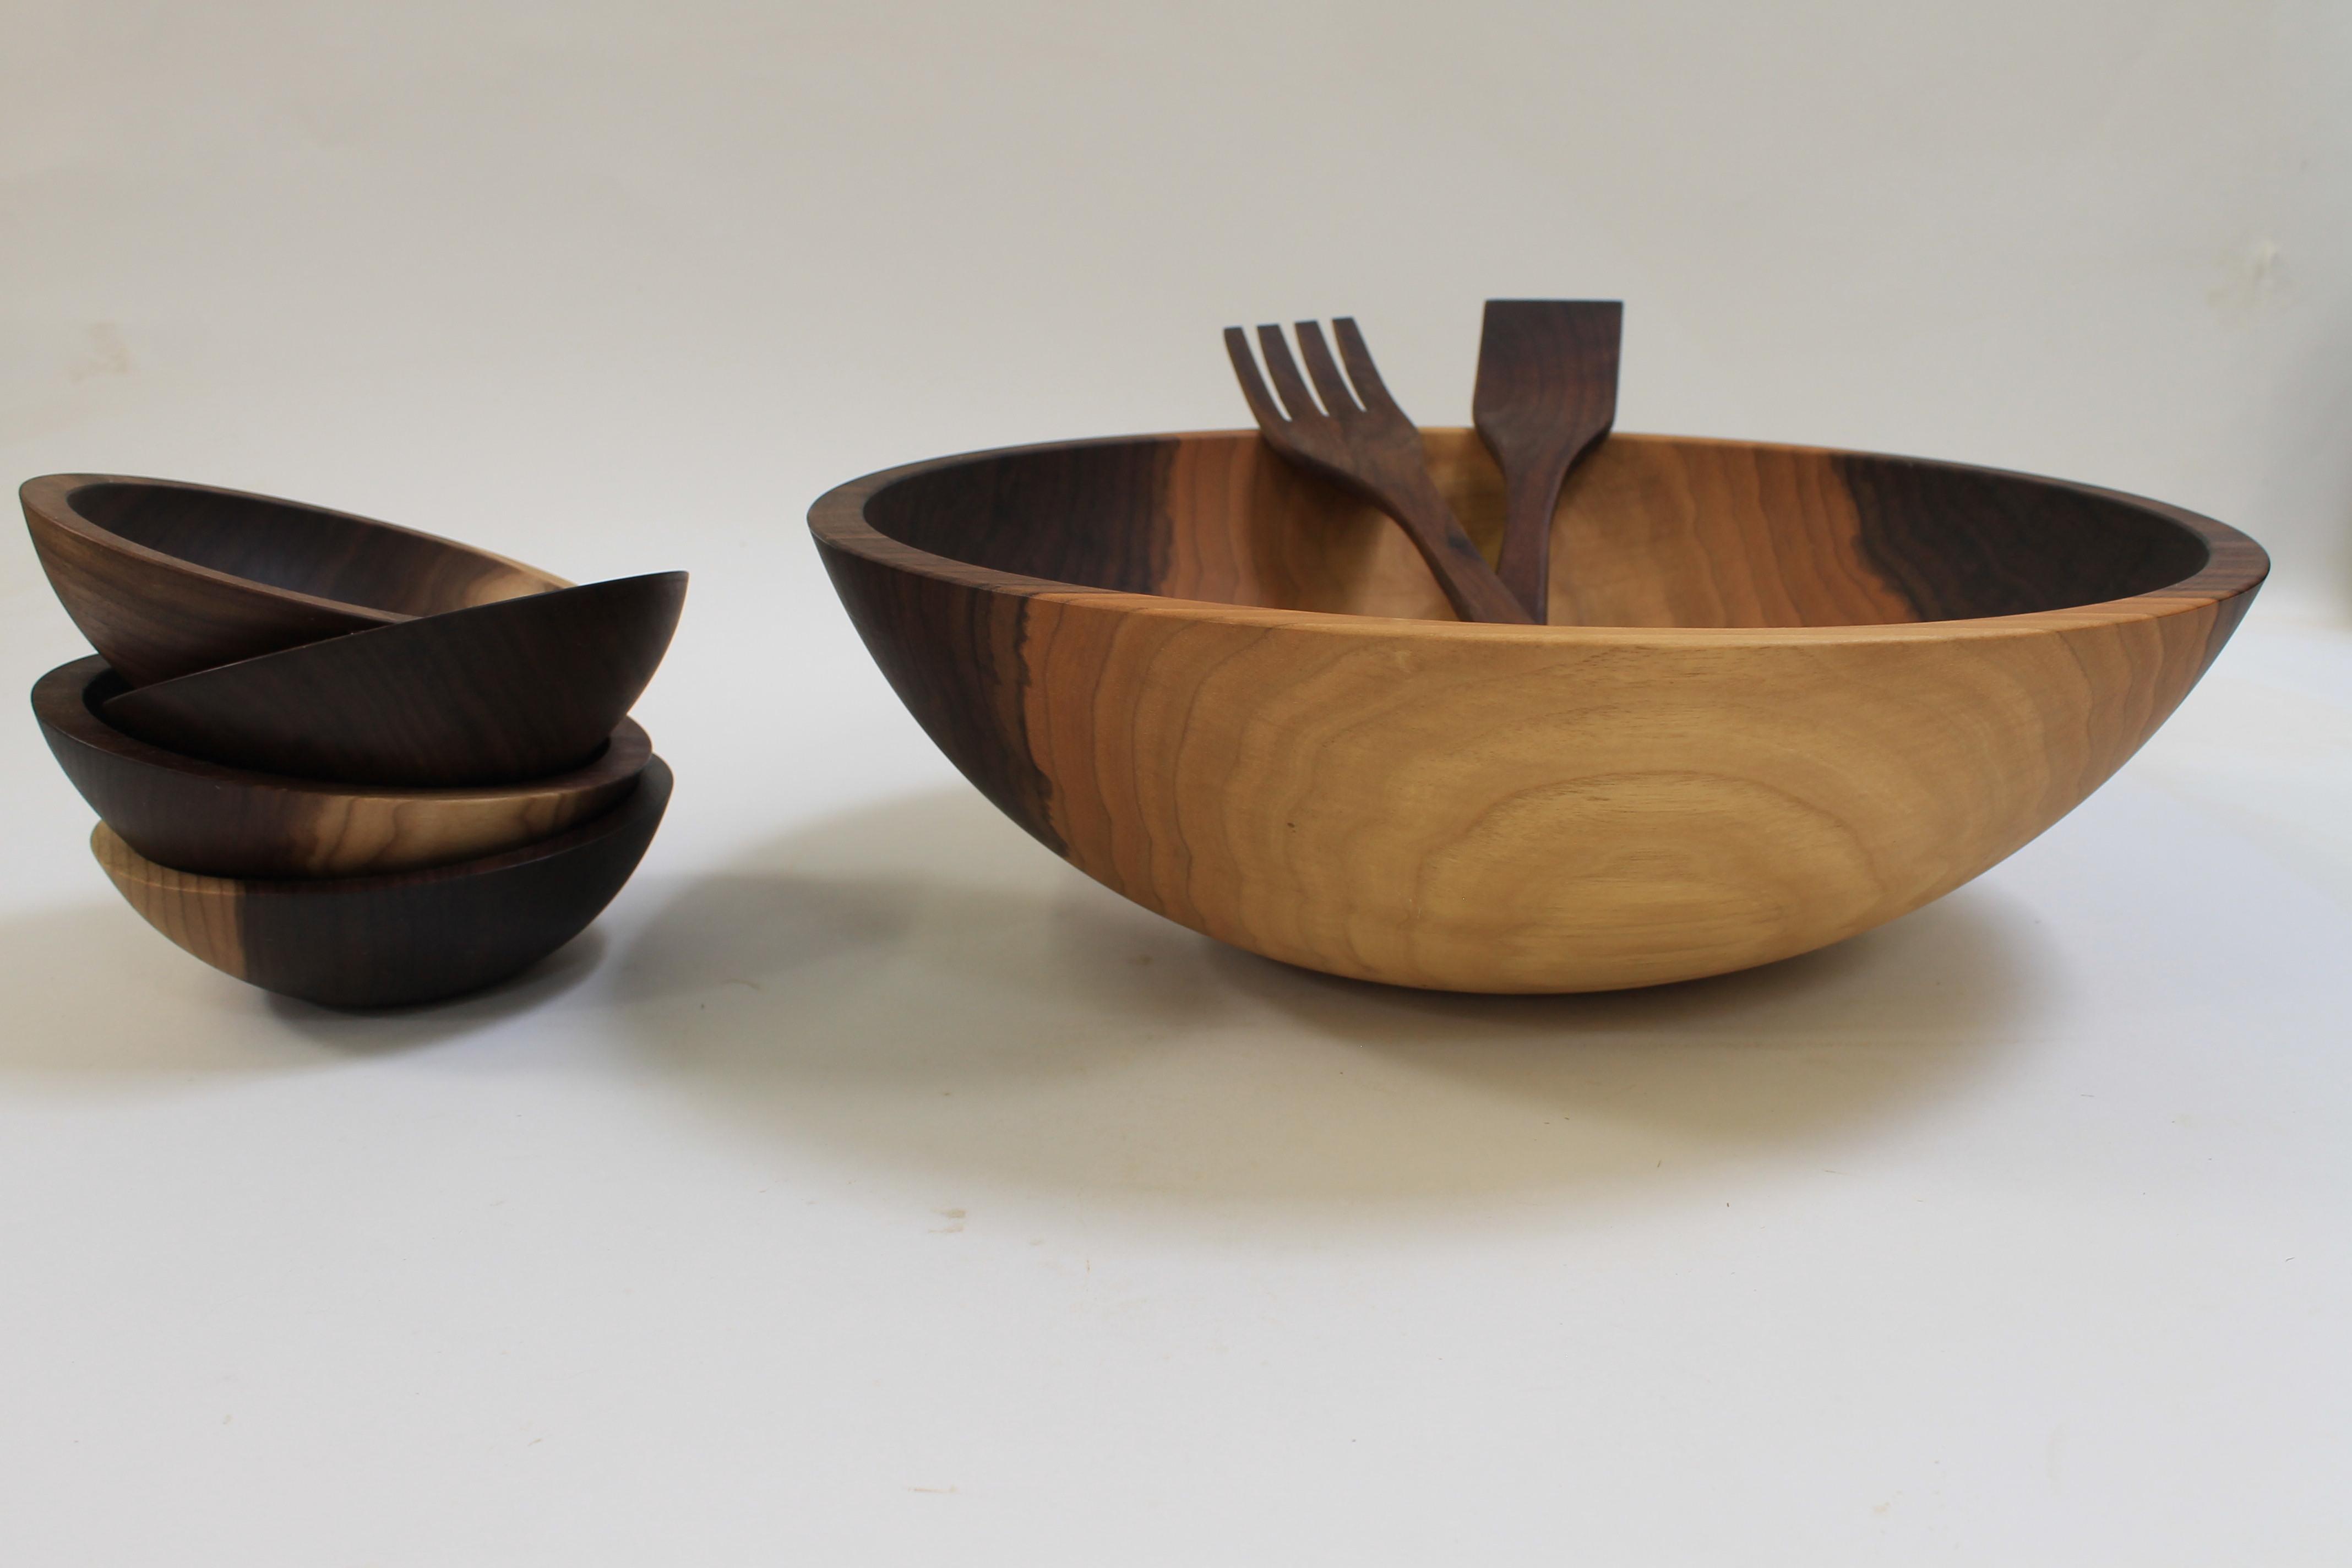 17 inch Walnut Bowl Set - Bee's Oil Finish W117B5S